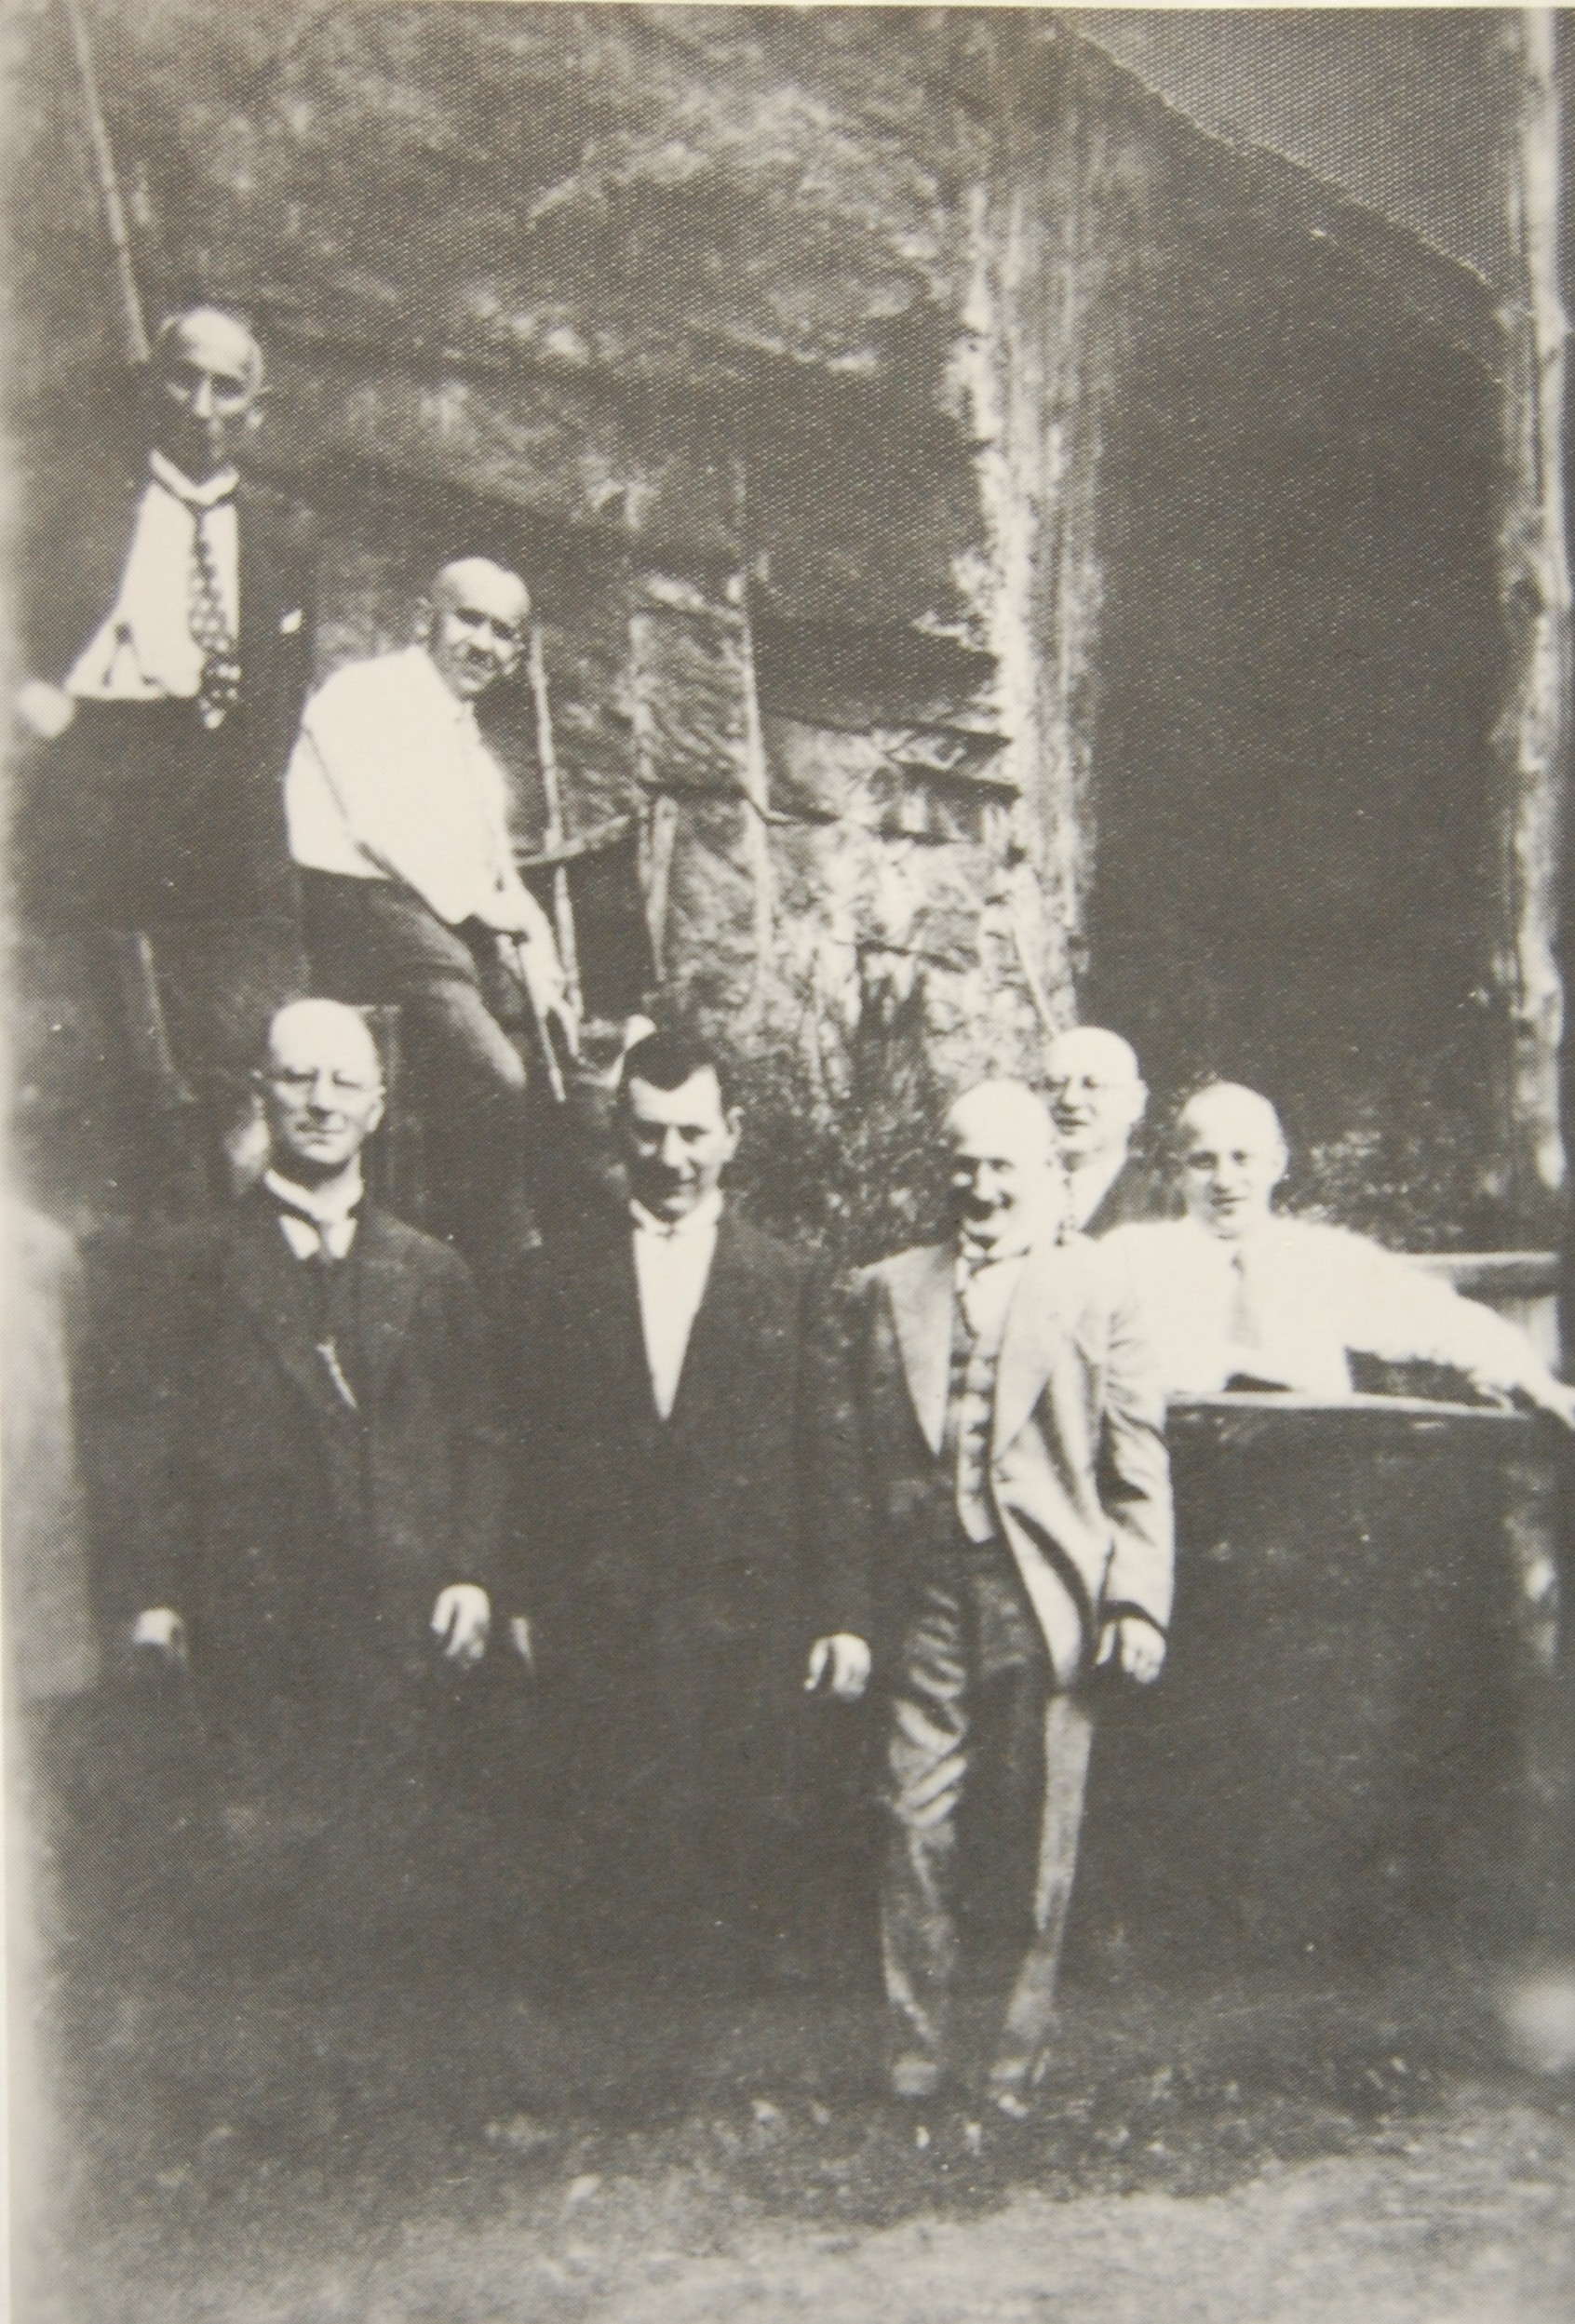 vorn v.l.n.r. Alex, Robert Felix Markus, dahinter v.l.n.r.: Max Burin, David Löwenstein, Isidor und Alfred Heumann (Foto: Archiv Möllers)